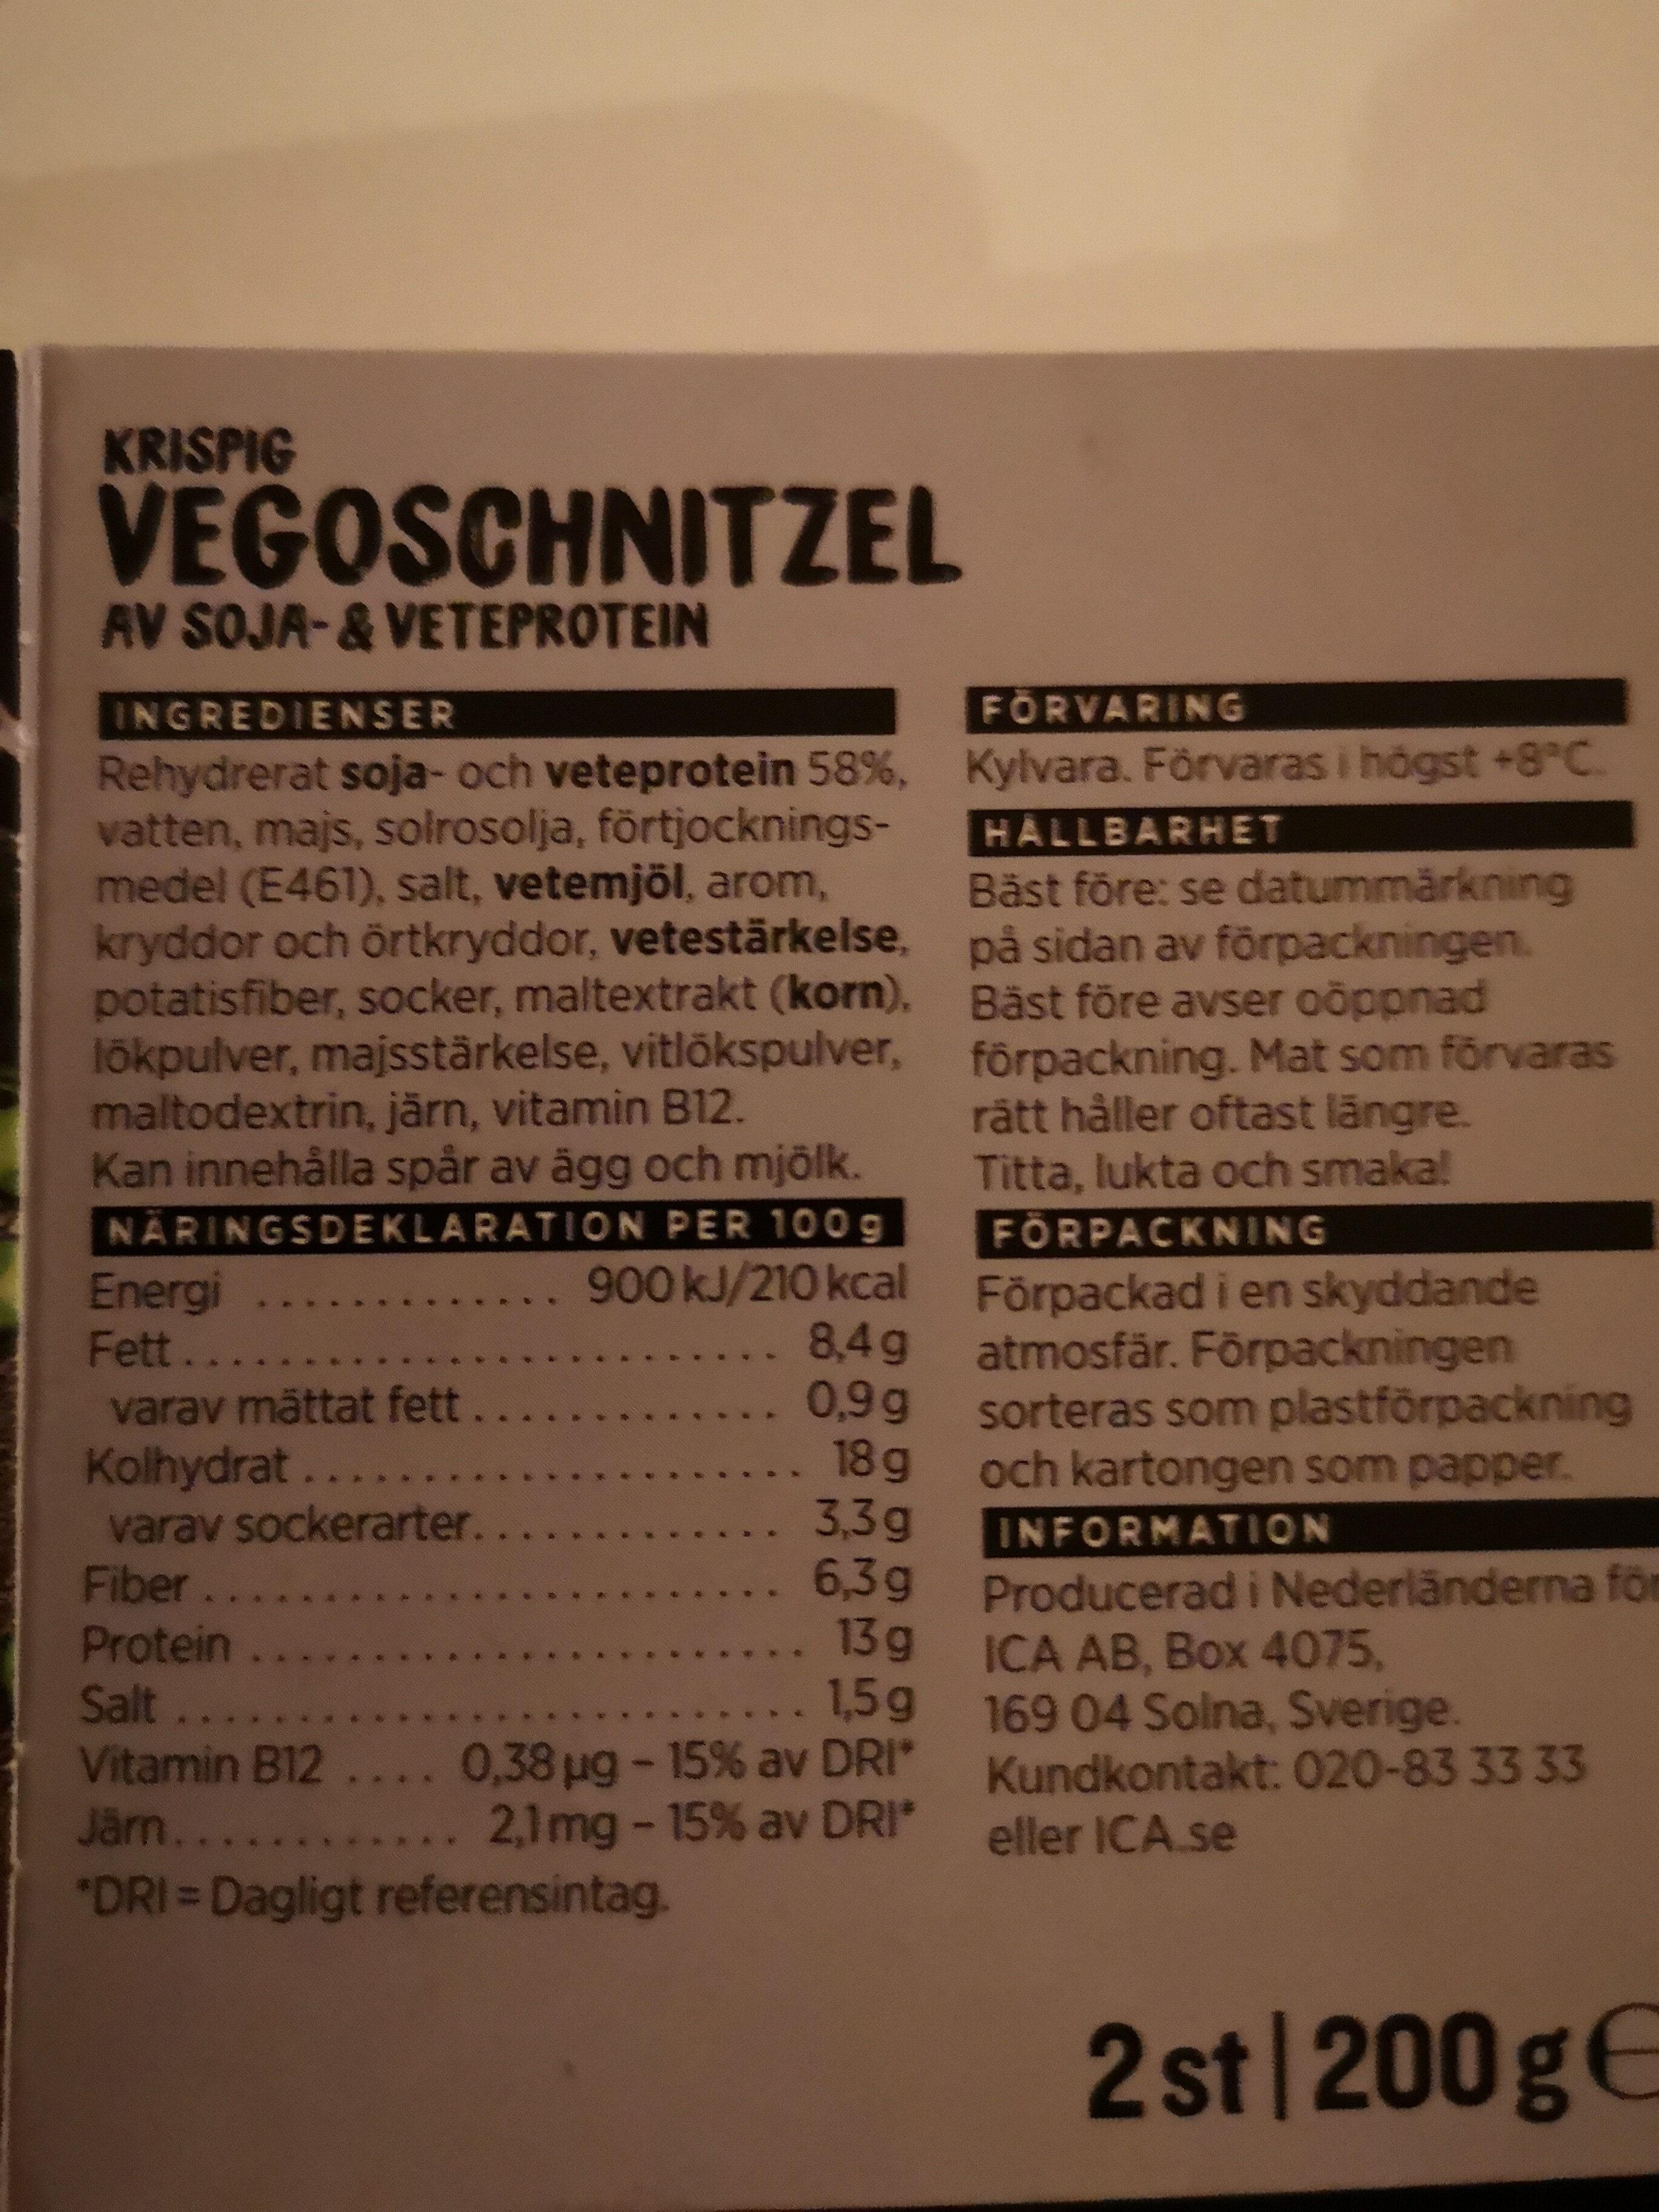 Vegoschnitzel - Ingrédients